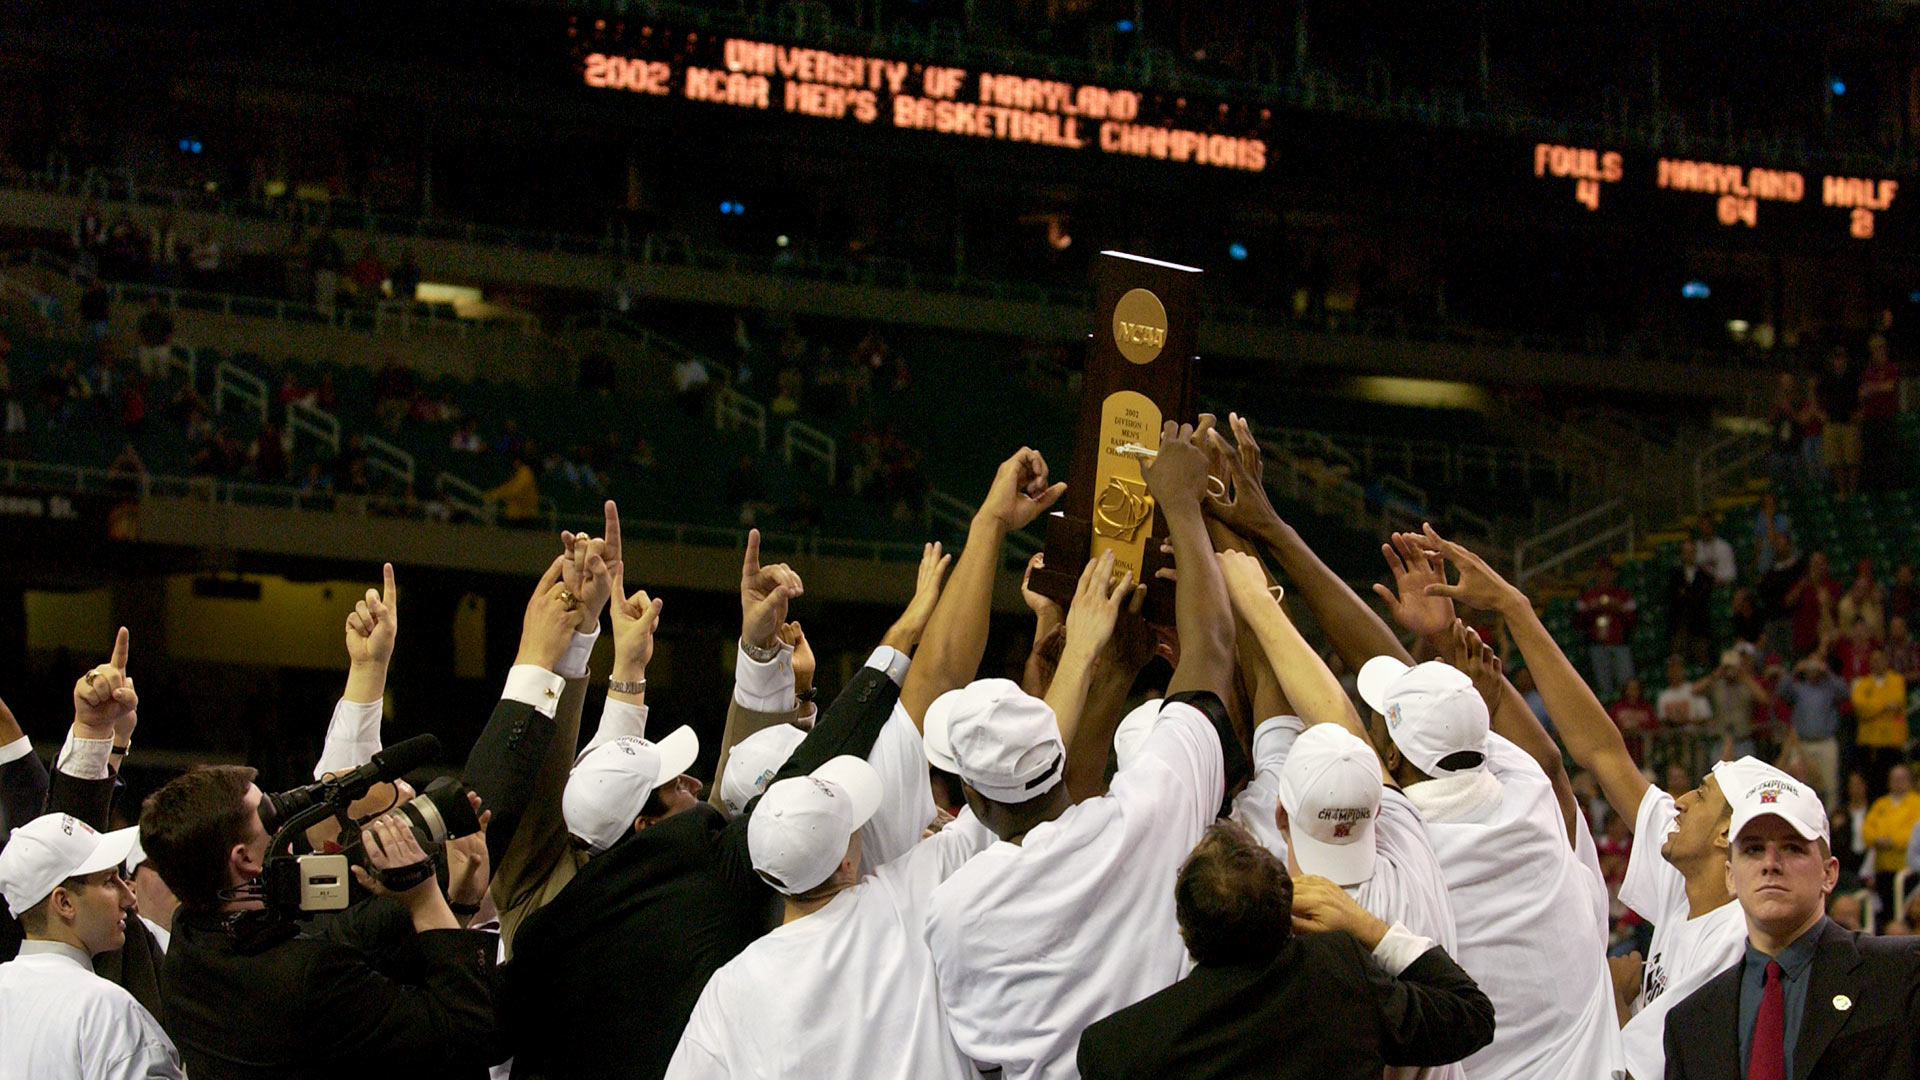 Maryland Basketball hoists NCAA Championship Trophy